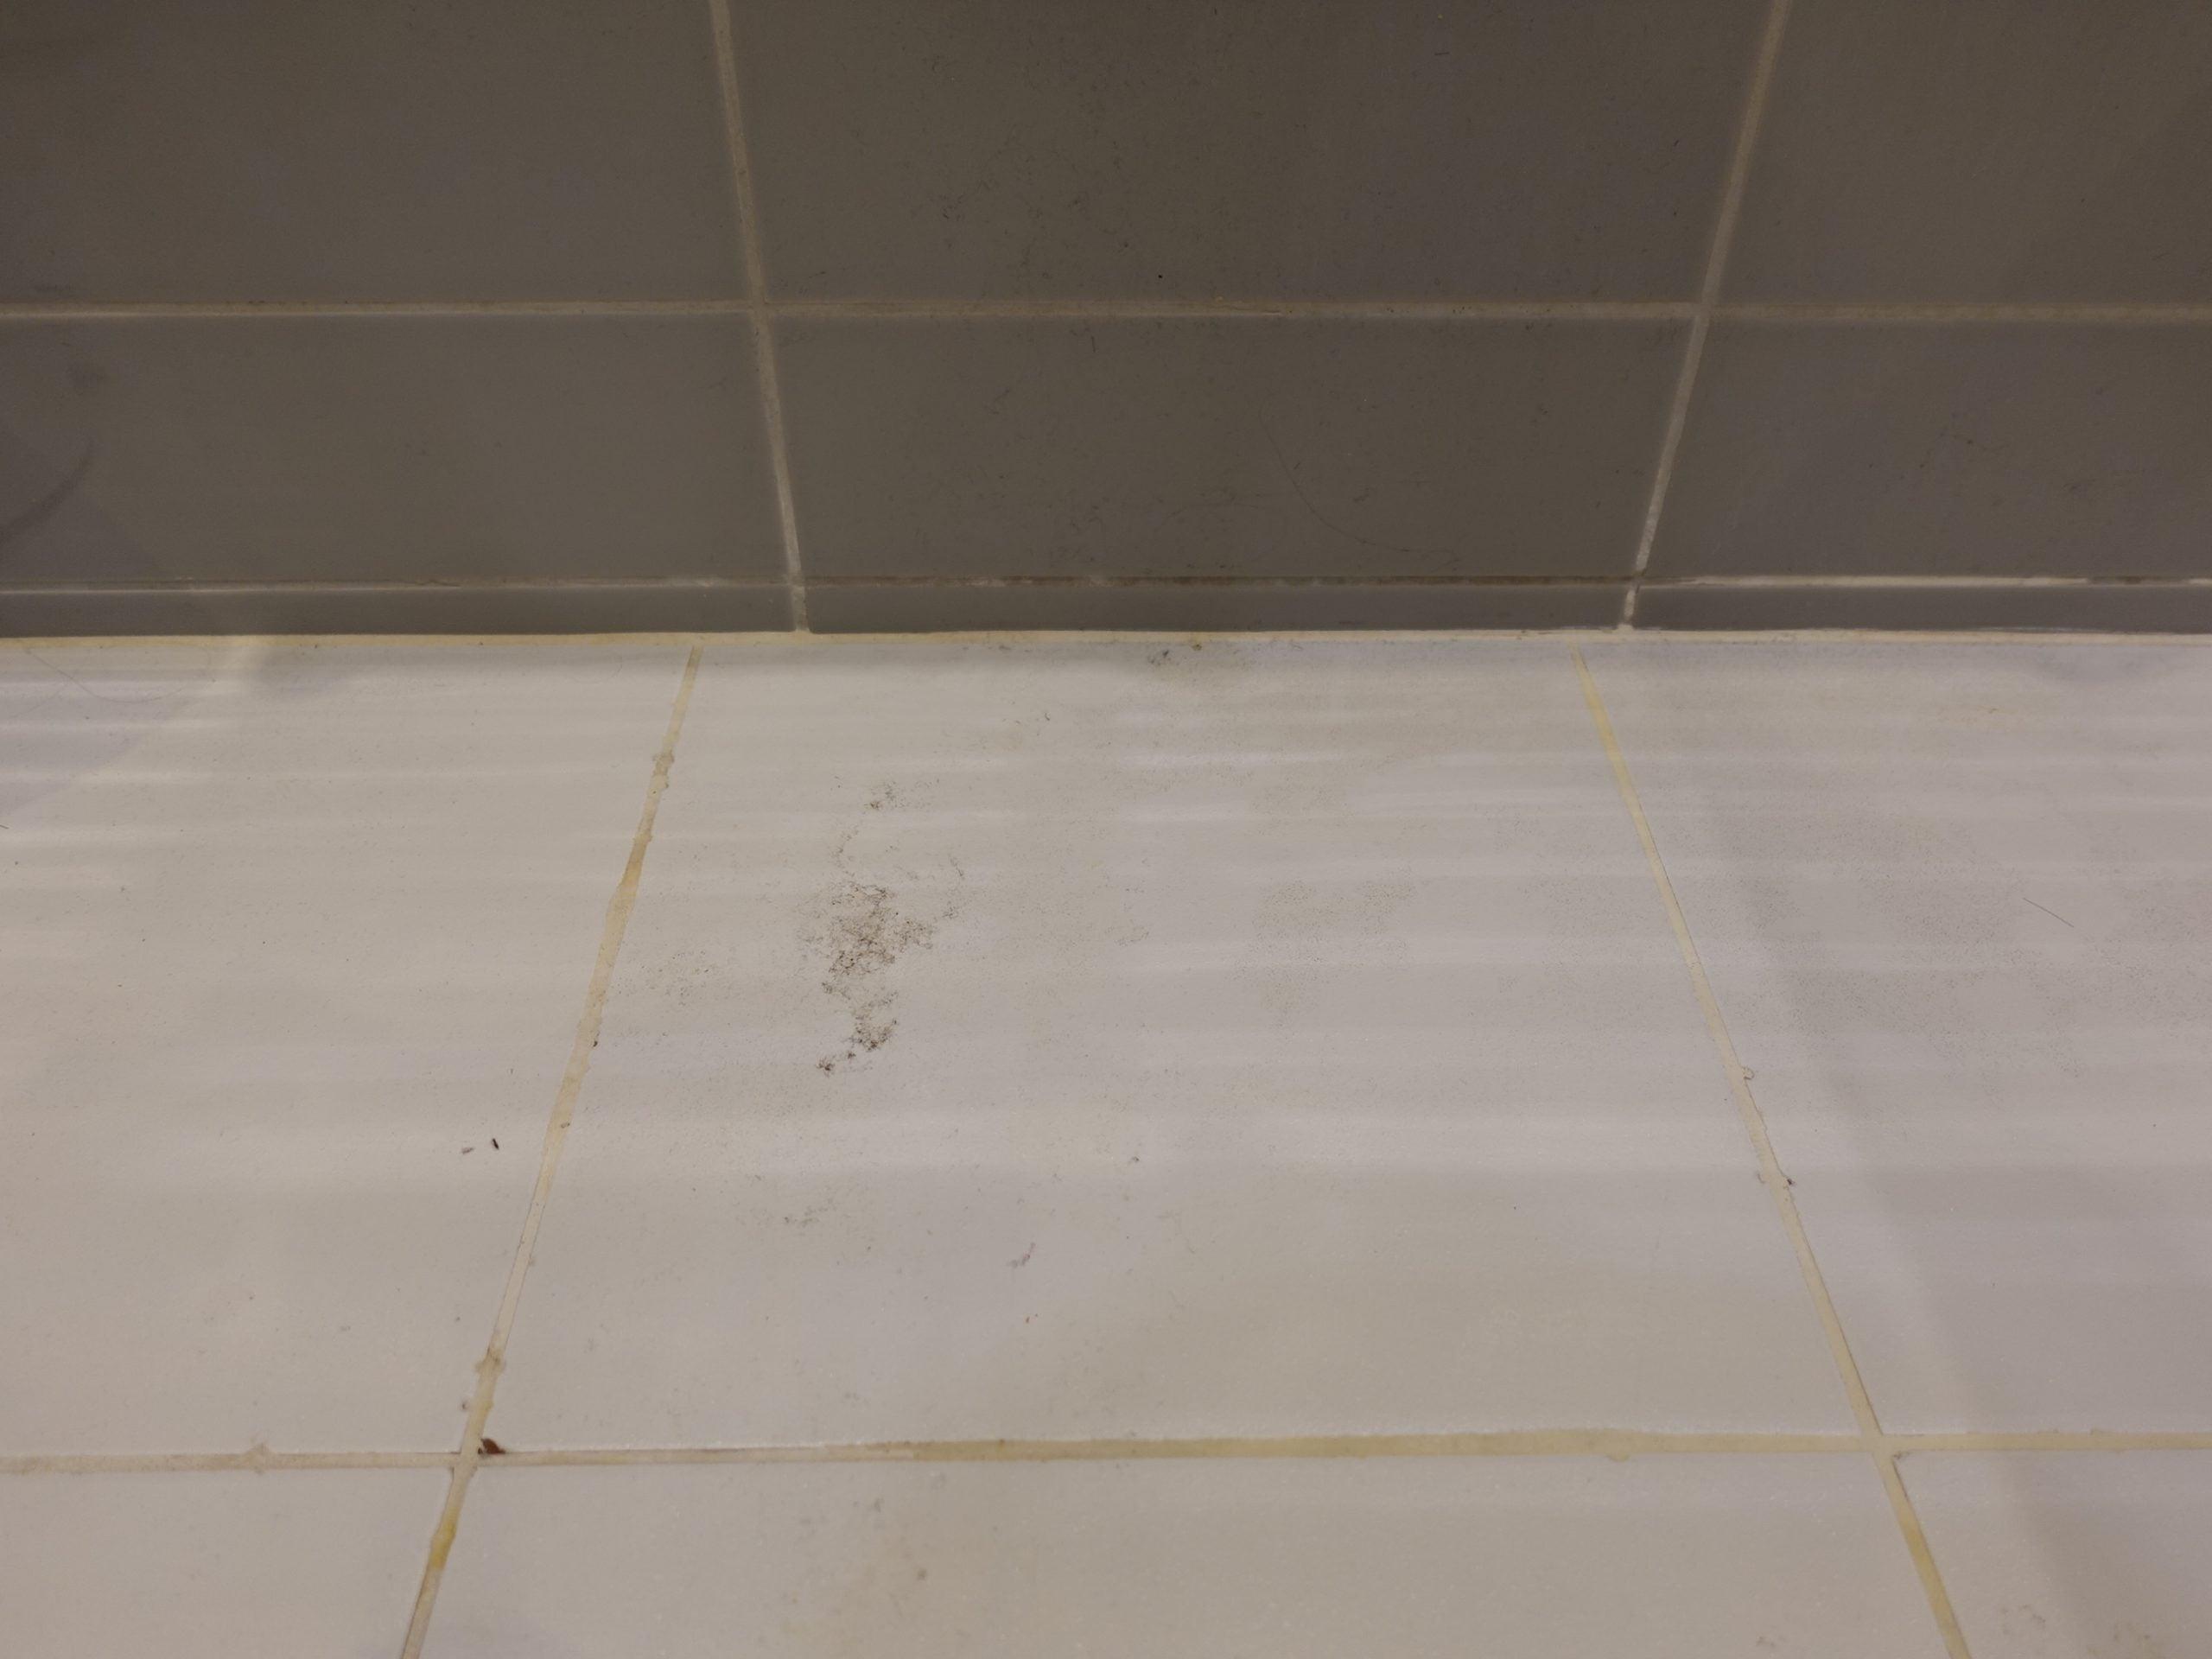 Karcher SC3 Upright EasyFix hard floor tiles dirty